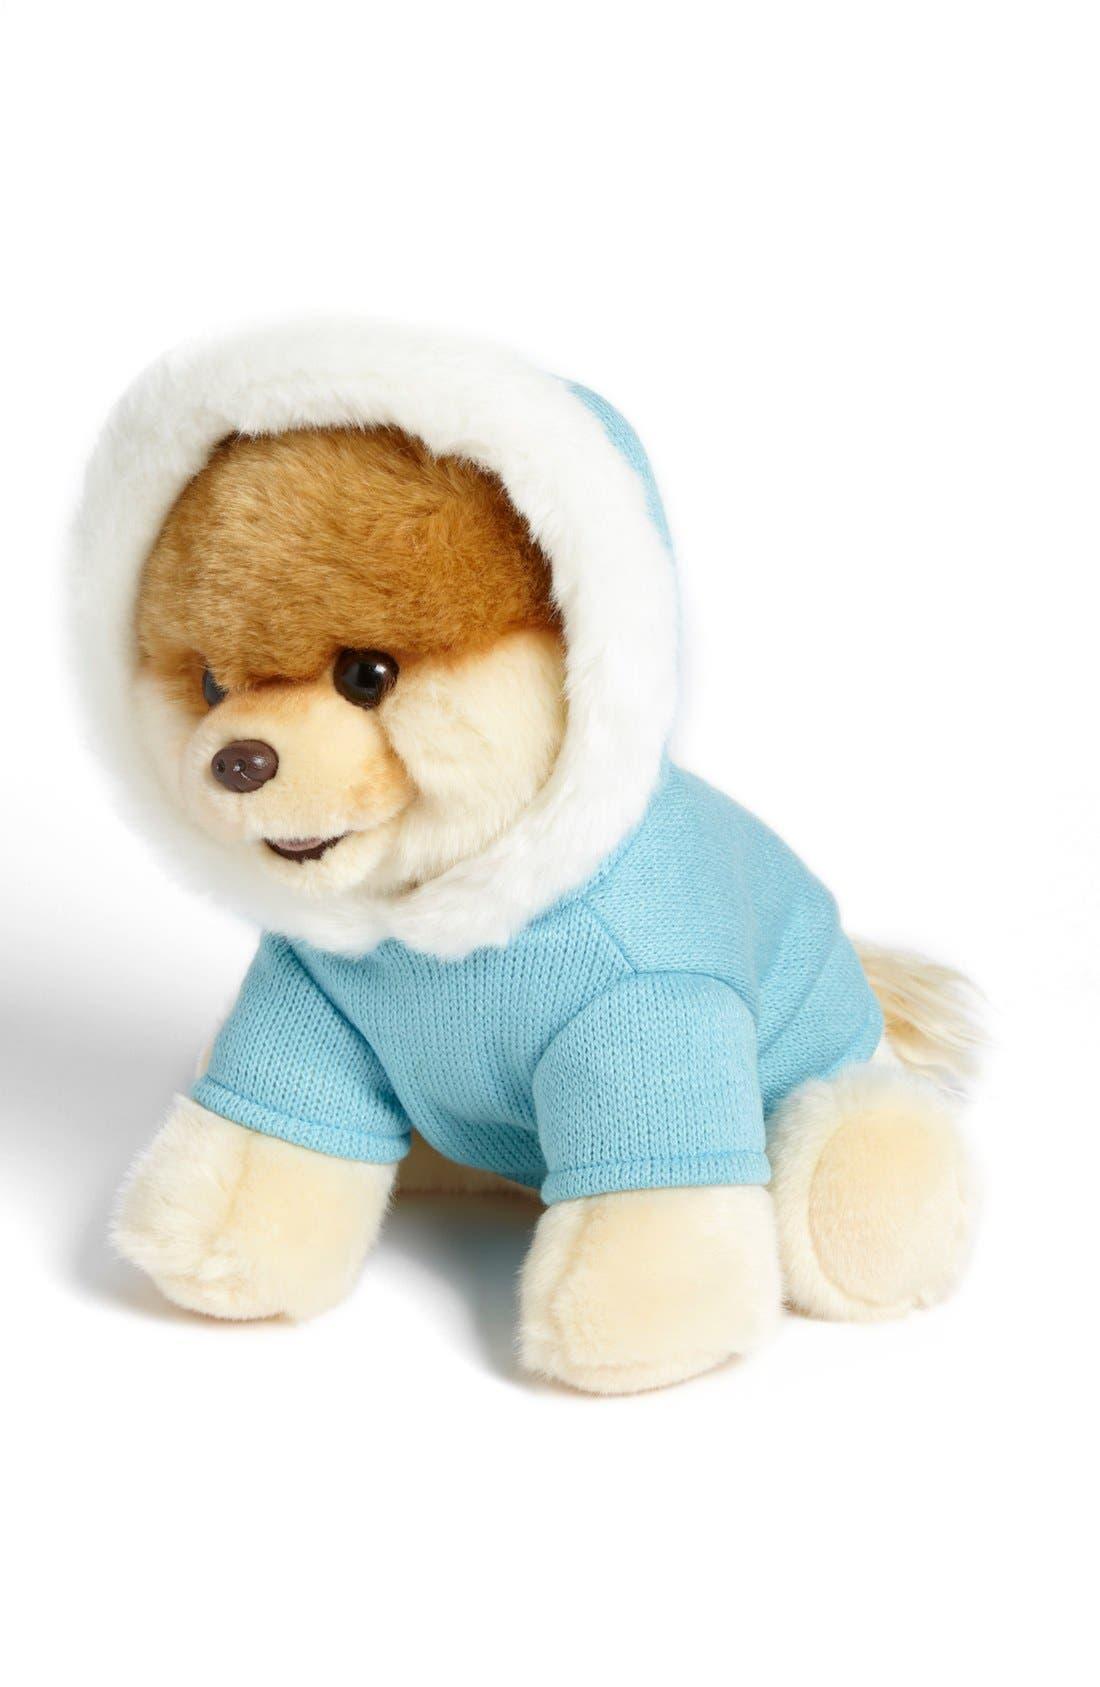 Main Image - Gund 'Boo' Stuffed Animal (Nordstrom Exclusive)